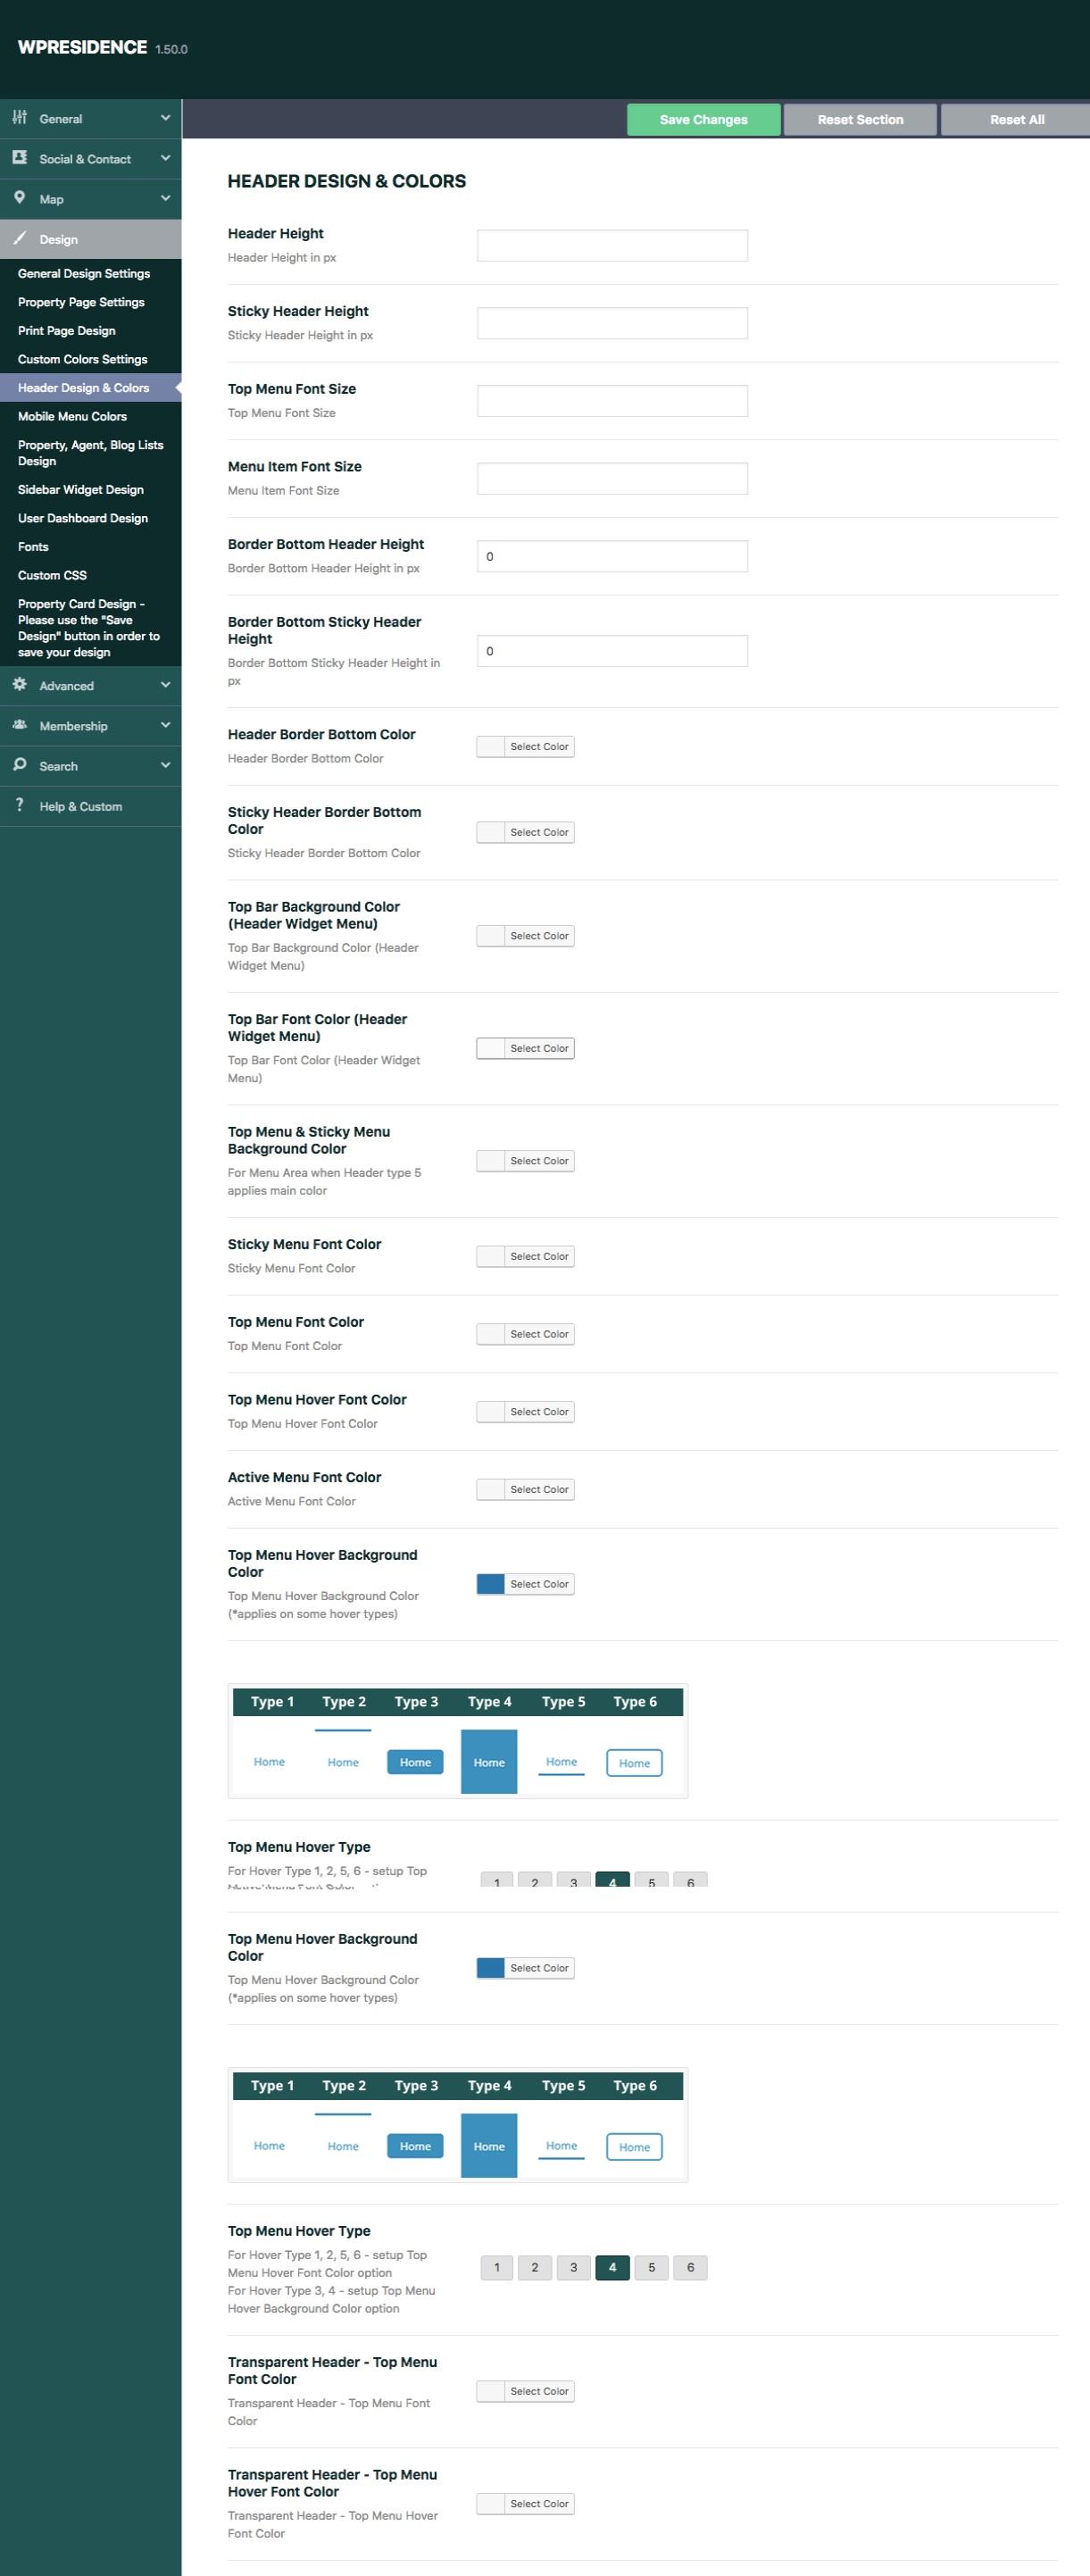 Malayalam Calendar 2019 Free Download Más Reciente Residence Real Estate WordPress theme by Wpestate Of Malayalam Calendar 2019 Free Download Más Populares Test & Zertifizierung Ehedg